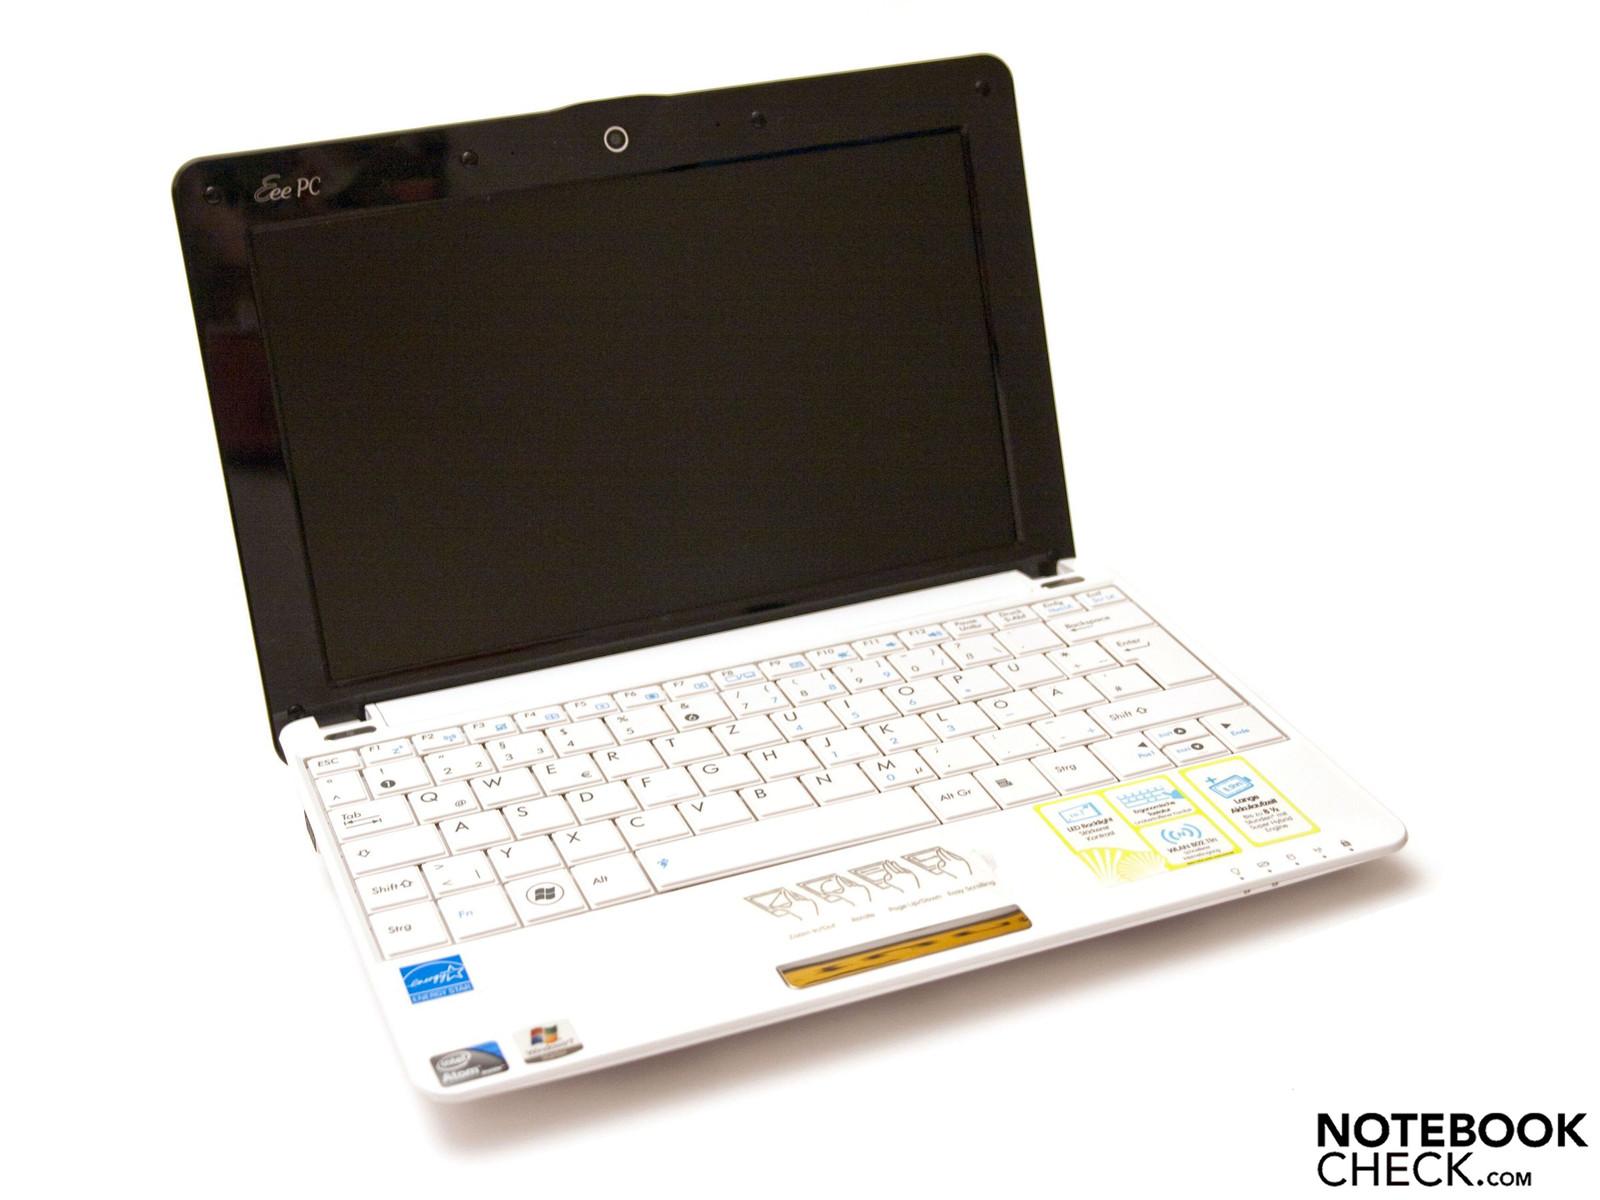 Laptop Driver: Asus Eee PC 900HA windows 7 drivers